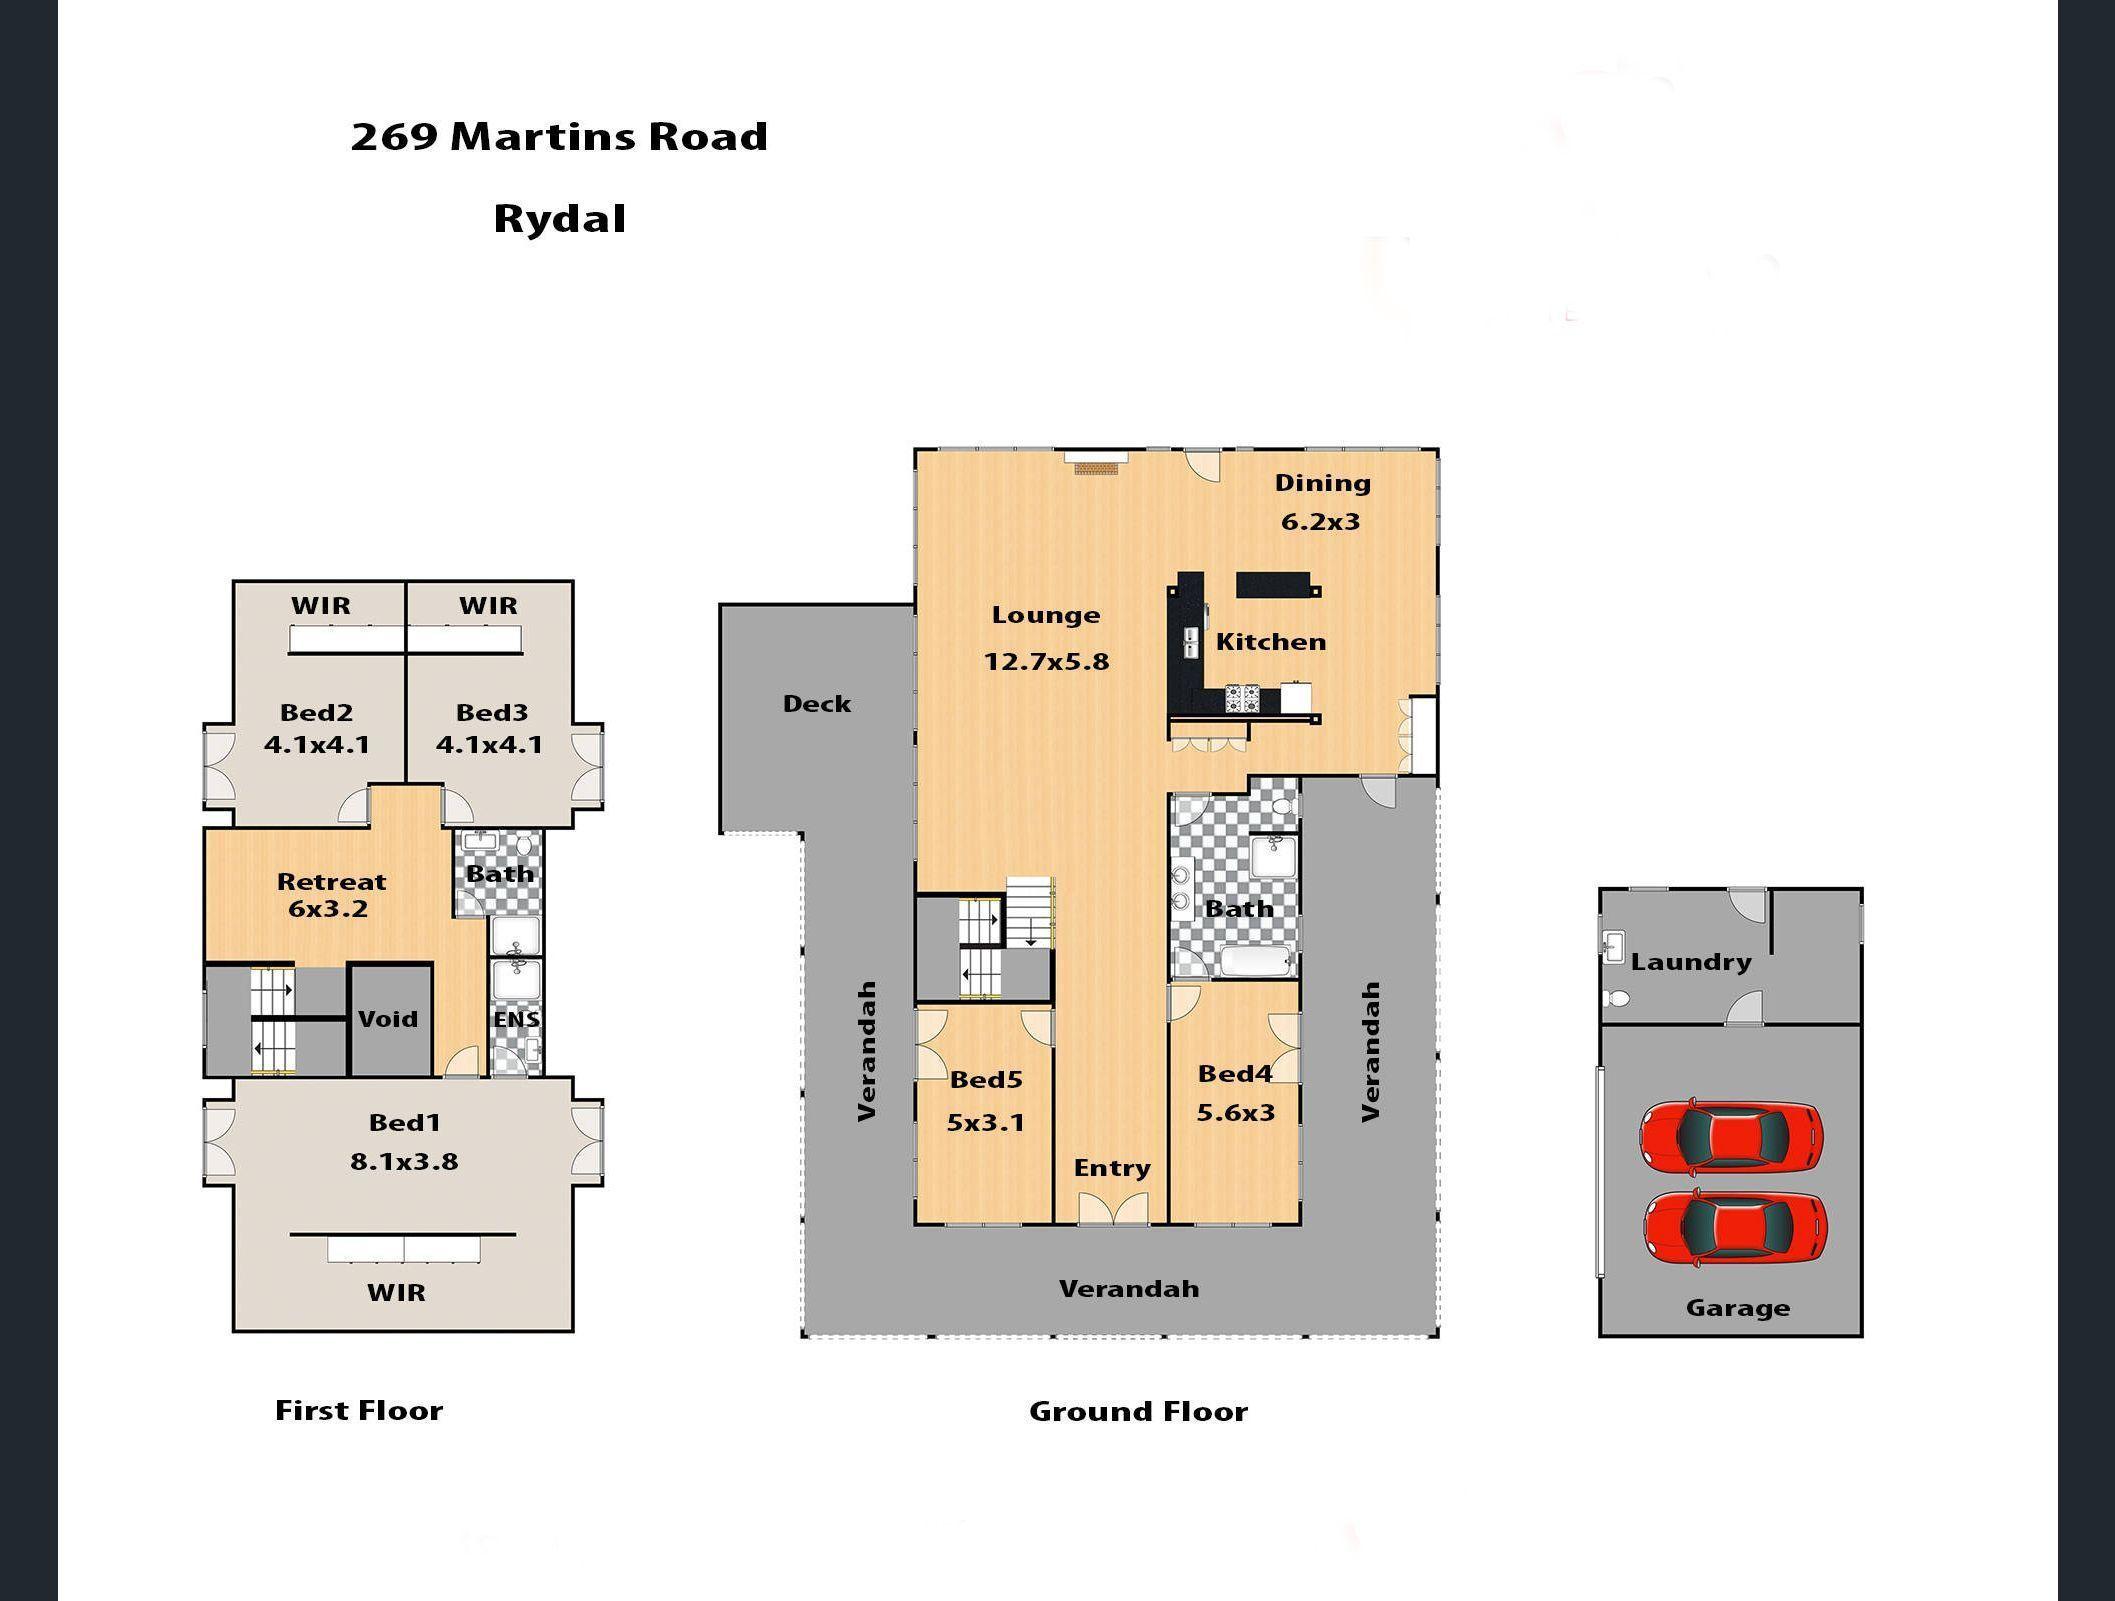 269 Martins Road, Rydal